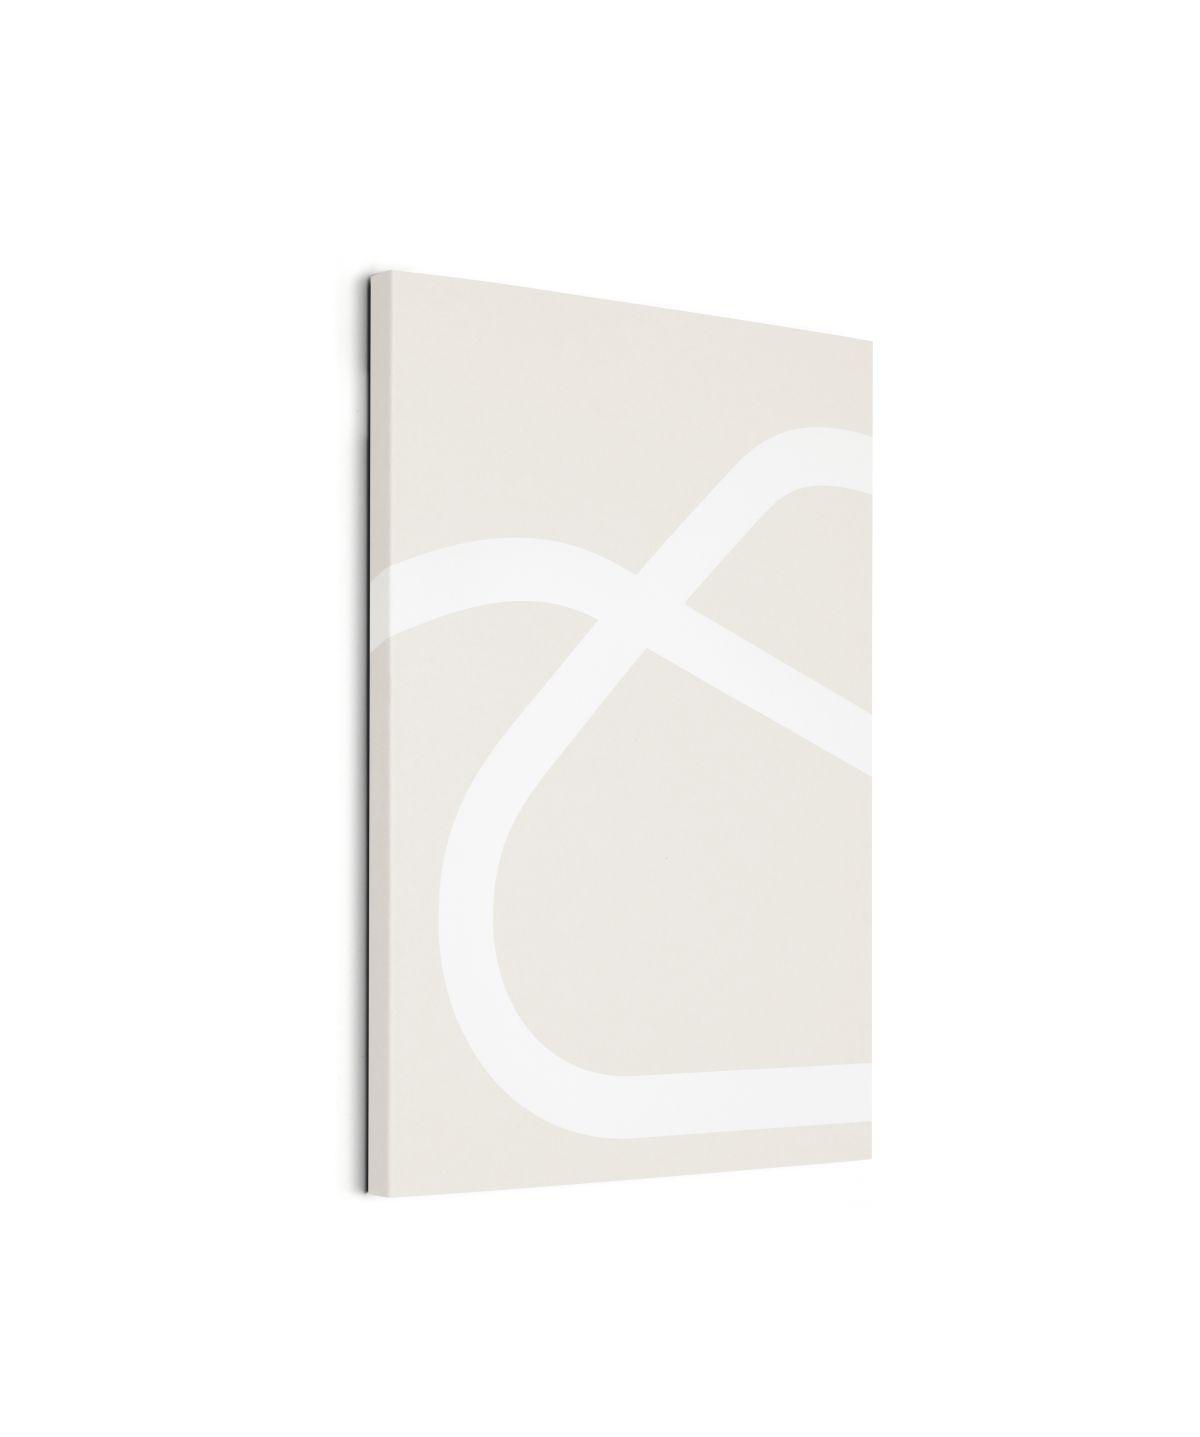 Outline Notebook, Tsto grey